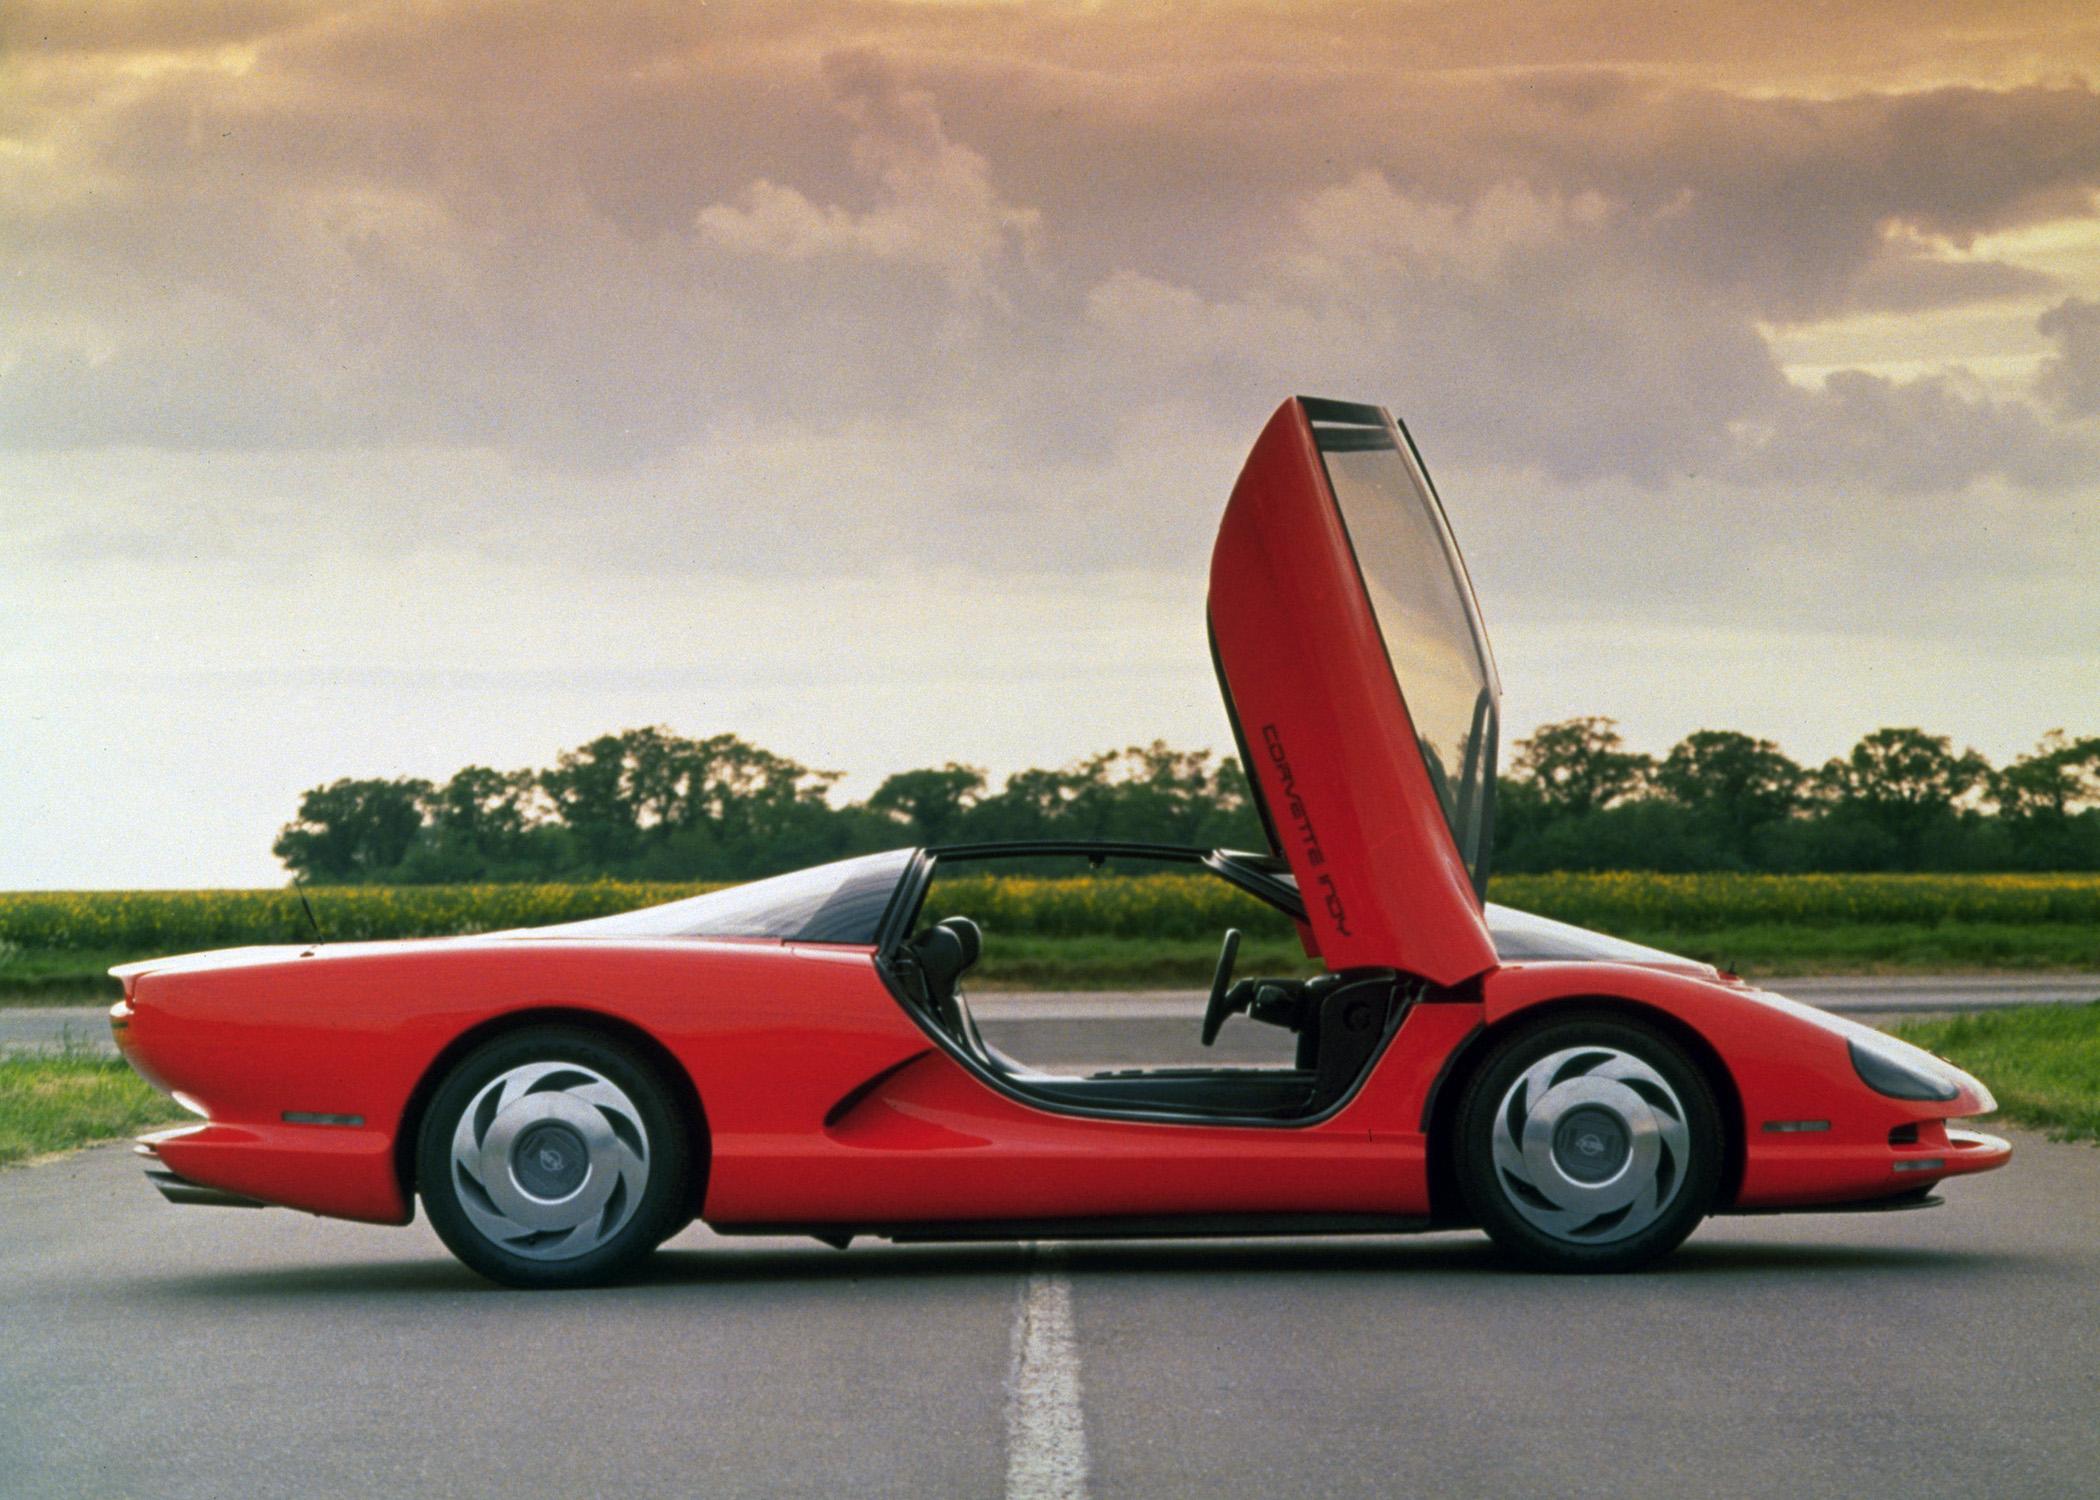 Corvette Indy